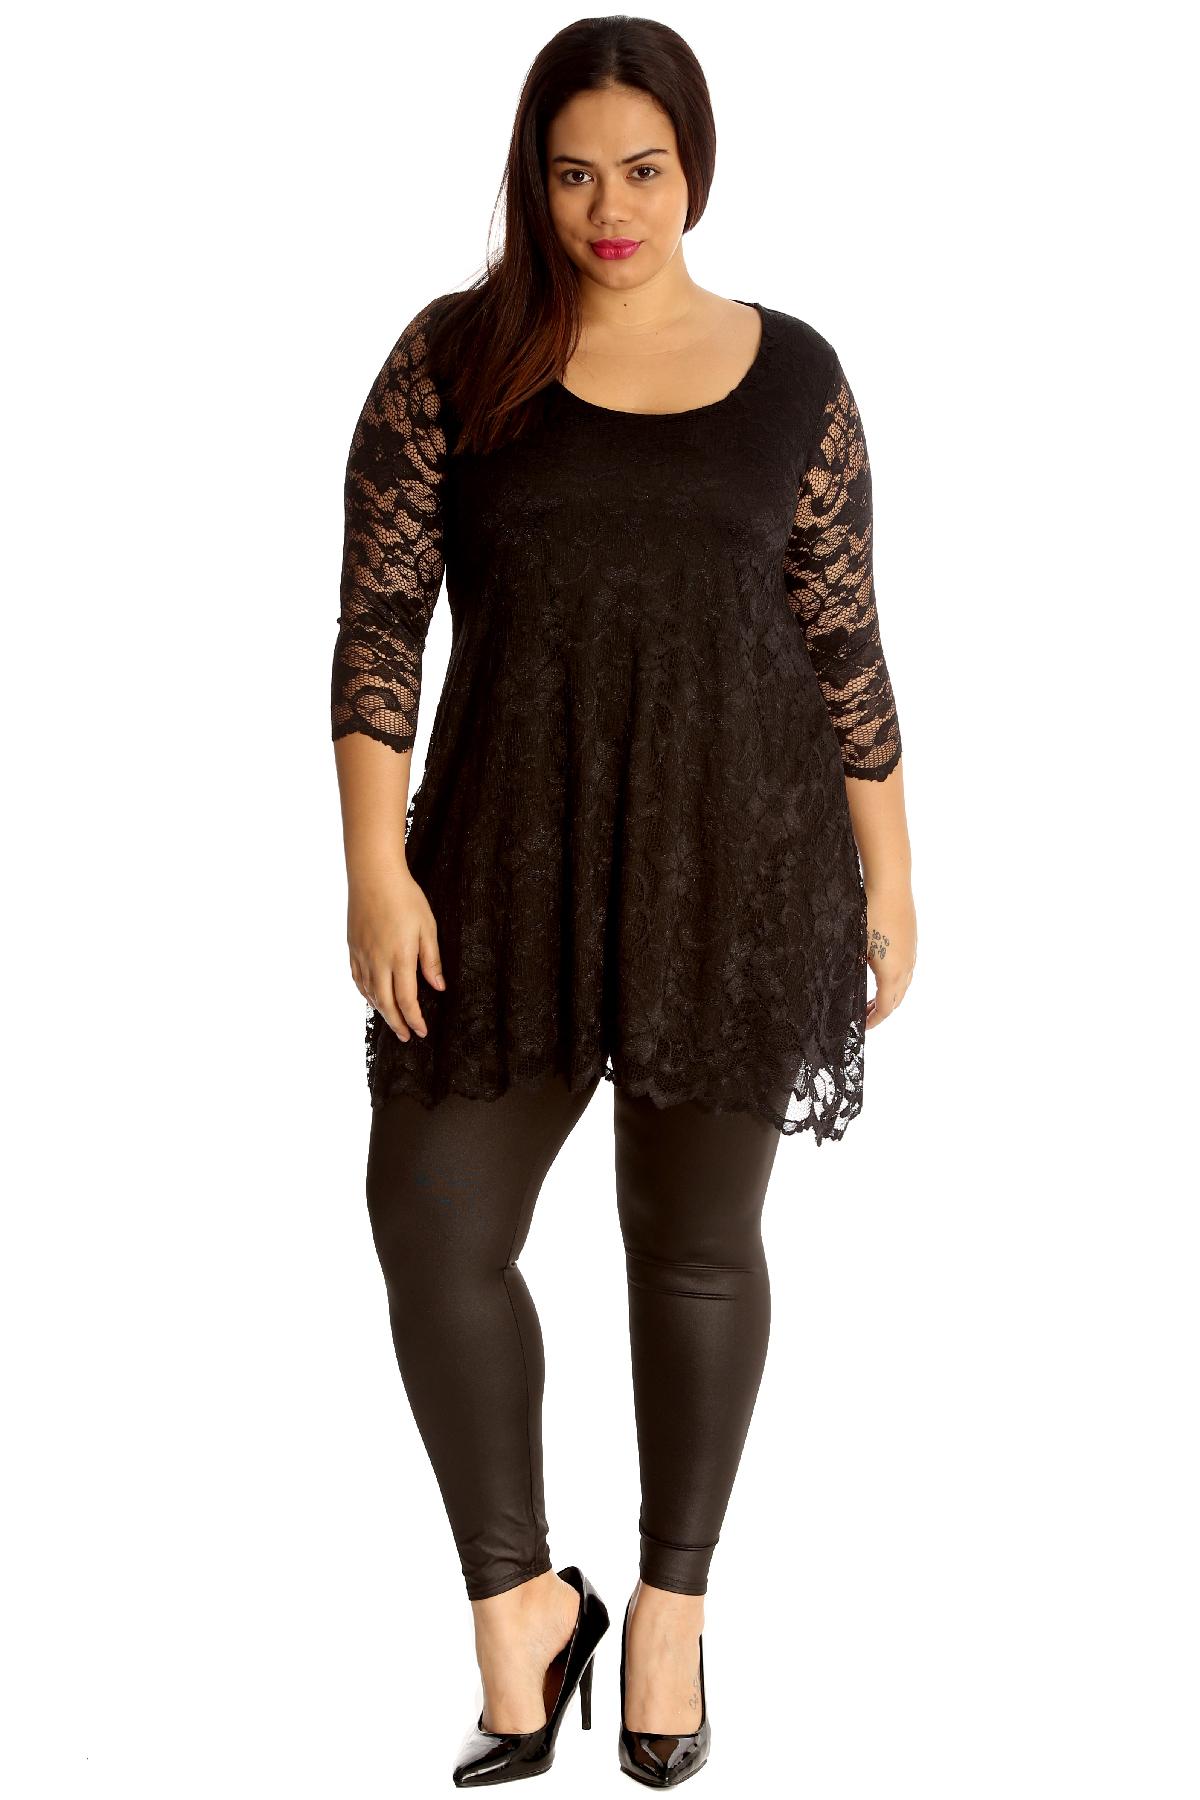 New Womens Plus Size Dress Ladies Tunic Blouse Floral Lace ...